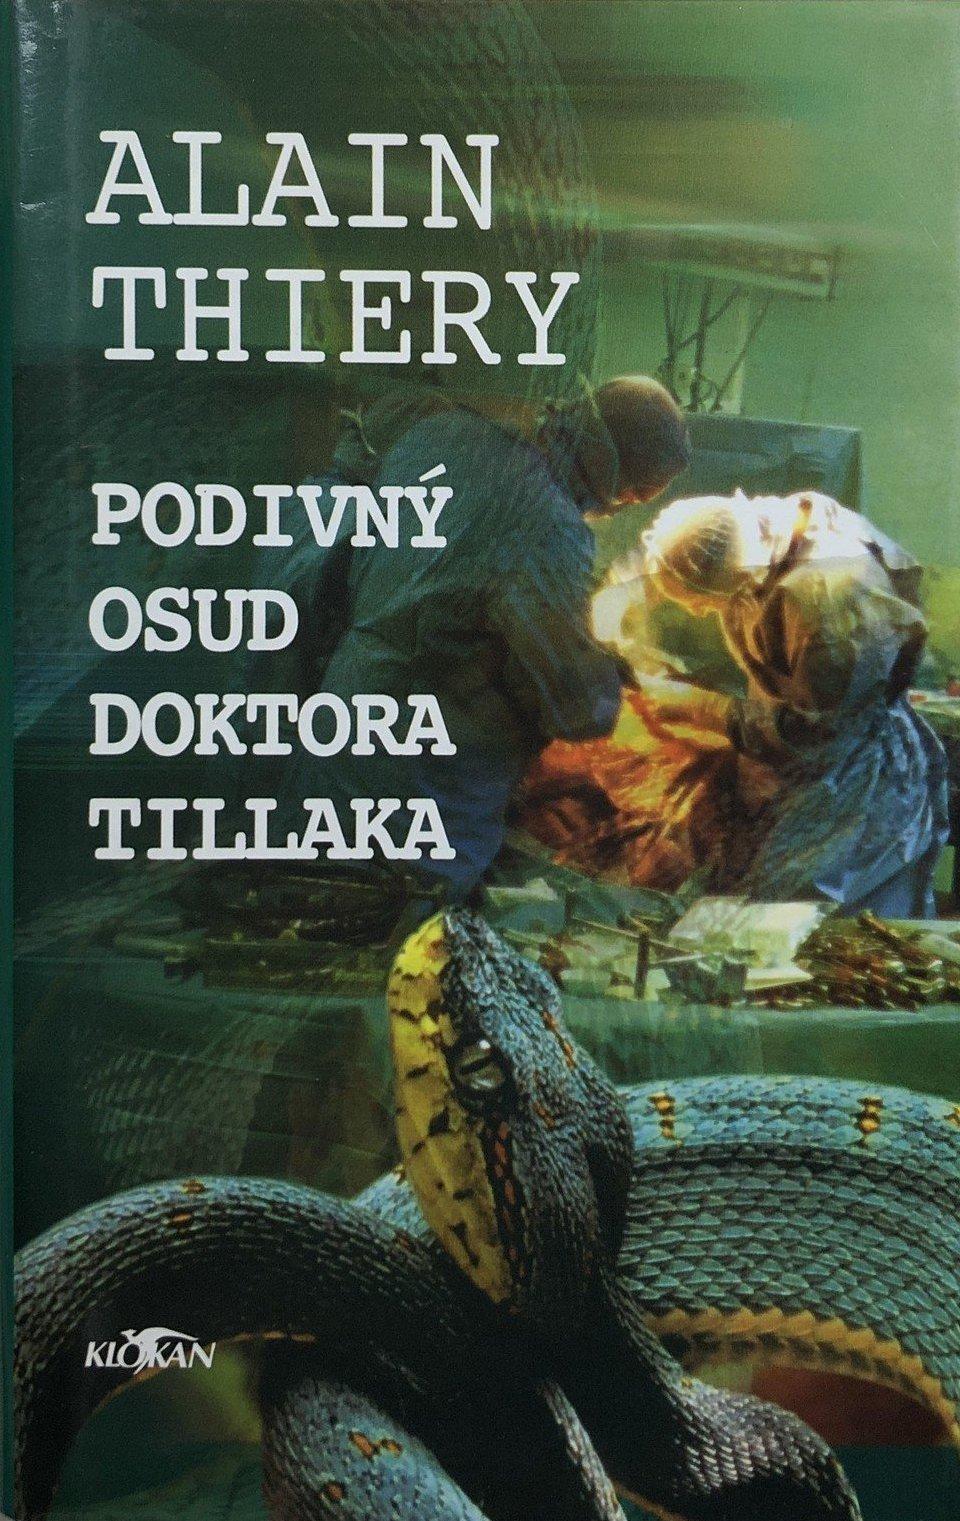 Podivný osud doktora Tillaka - Alain Thiery